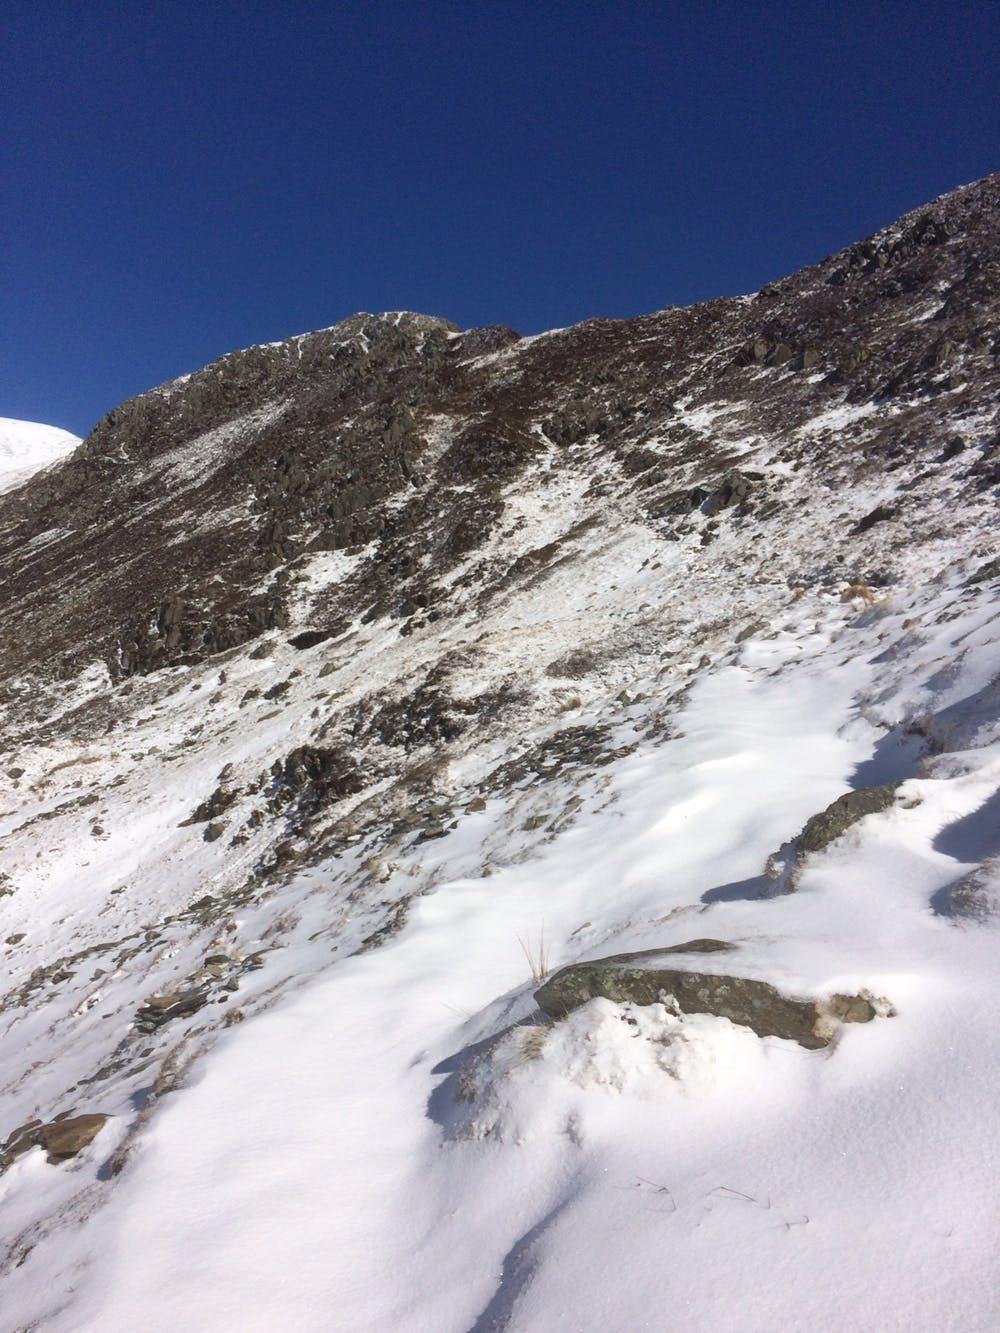 Snowdonia in the snow